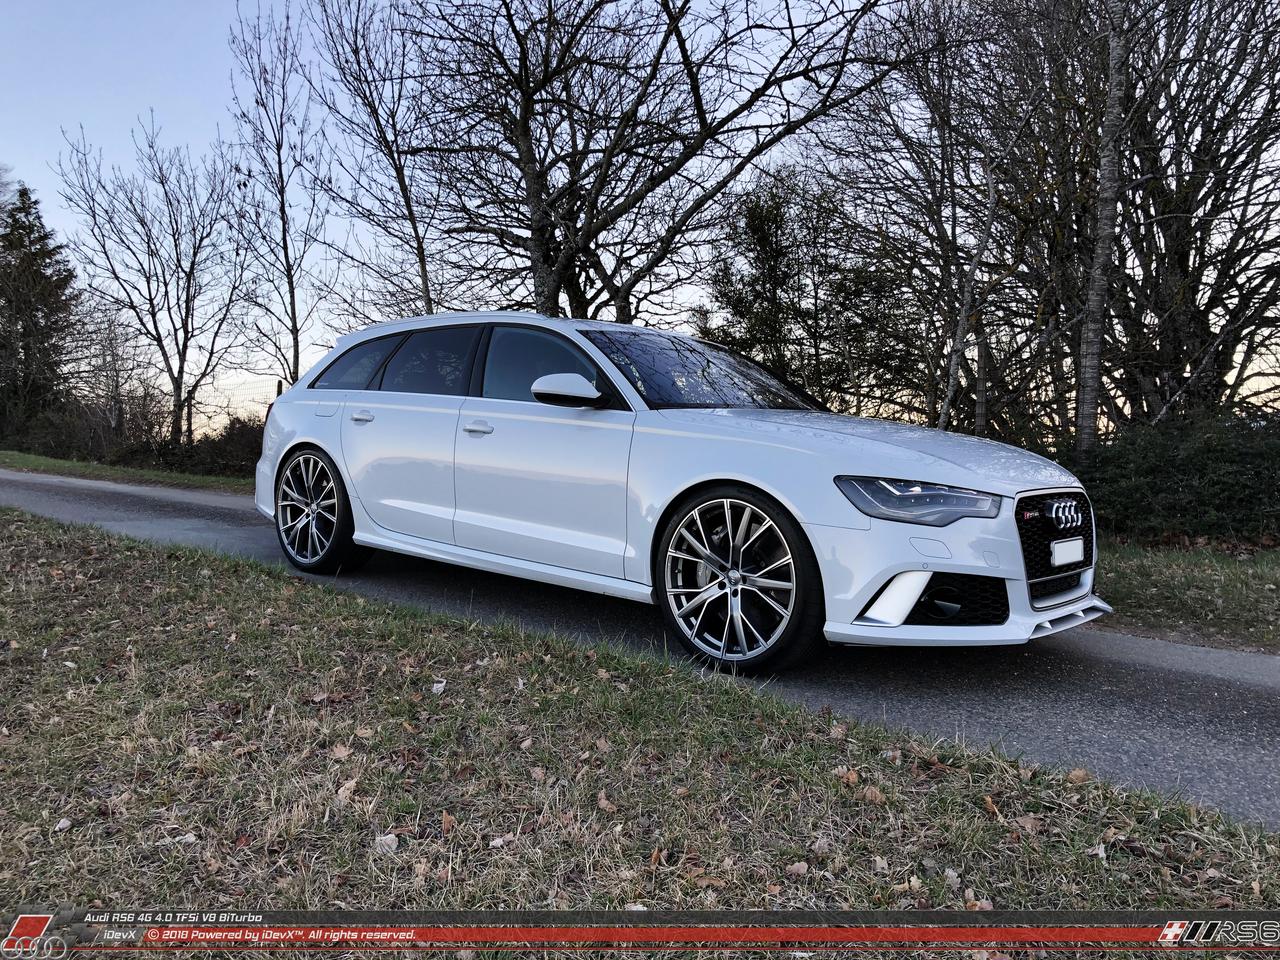 22_02.2019_Audi-RS6_iDevX_002.png